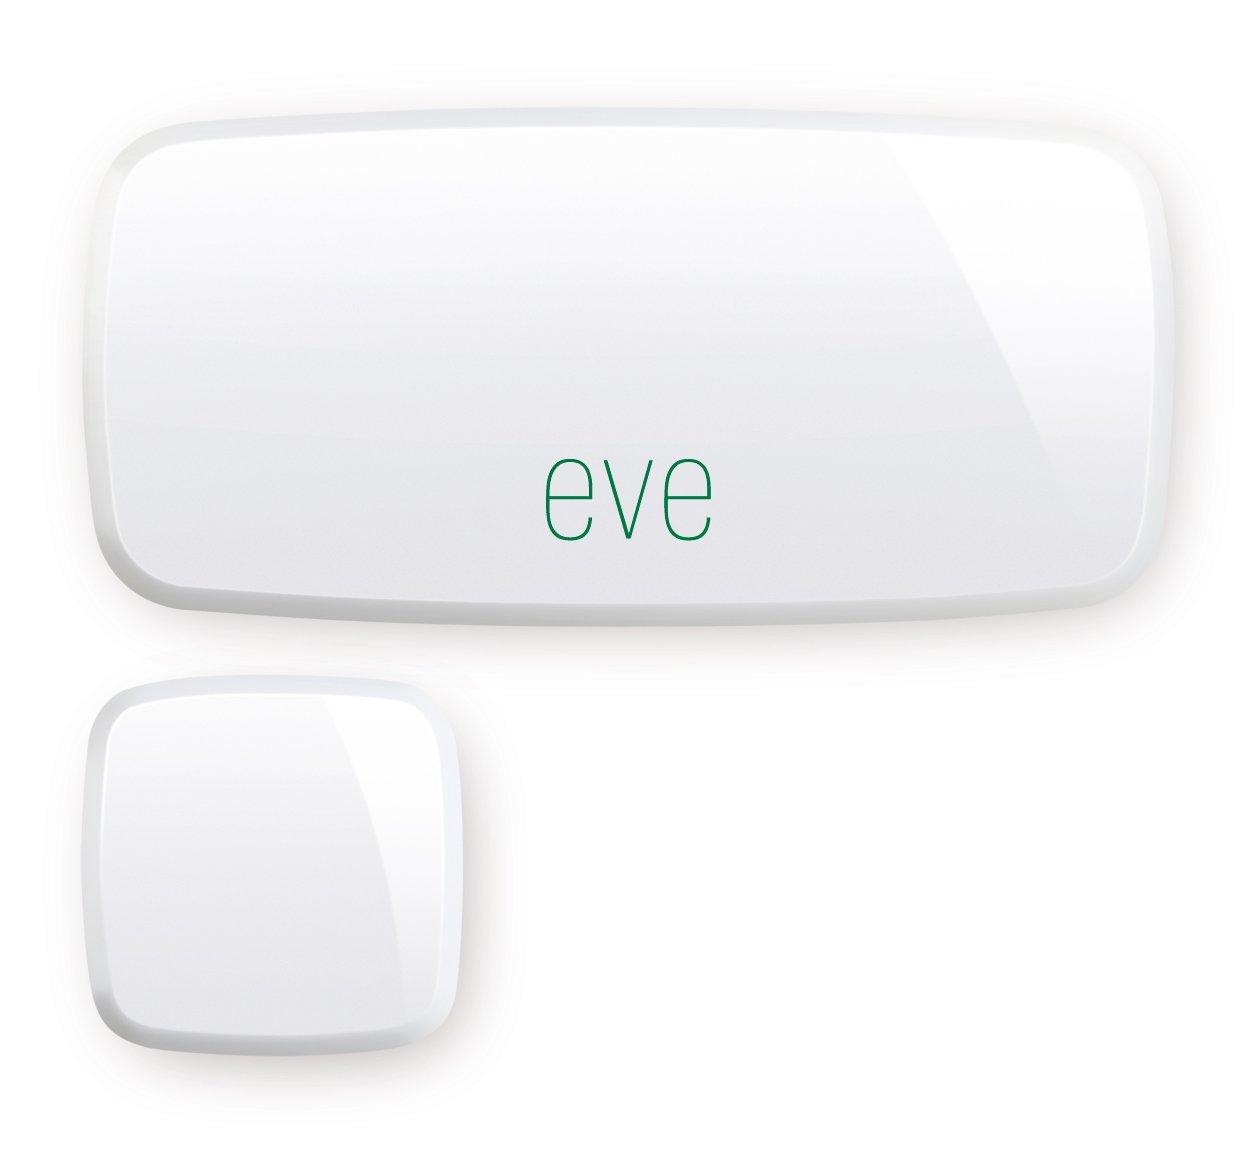 Elgato Eve Door & Window (1st Generation) - Wireless Contact Sensor with Apple HomeKit technology, Bluetooth Low Energy